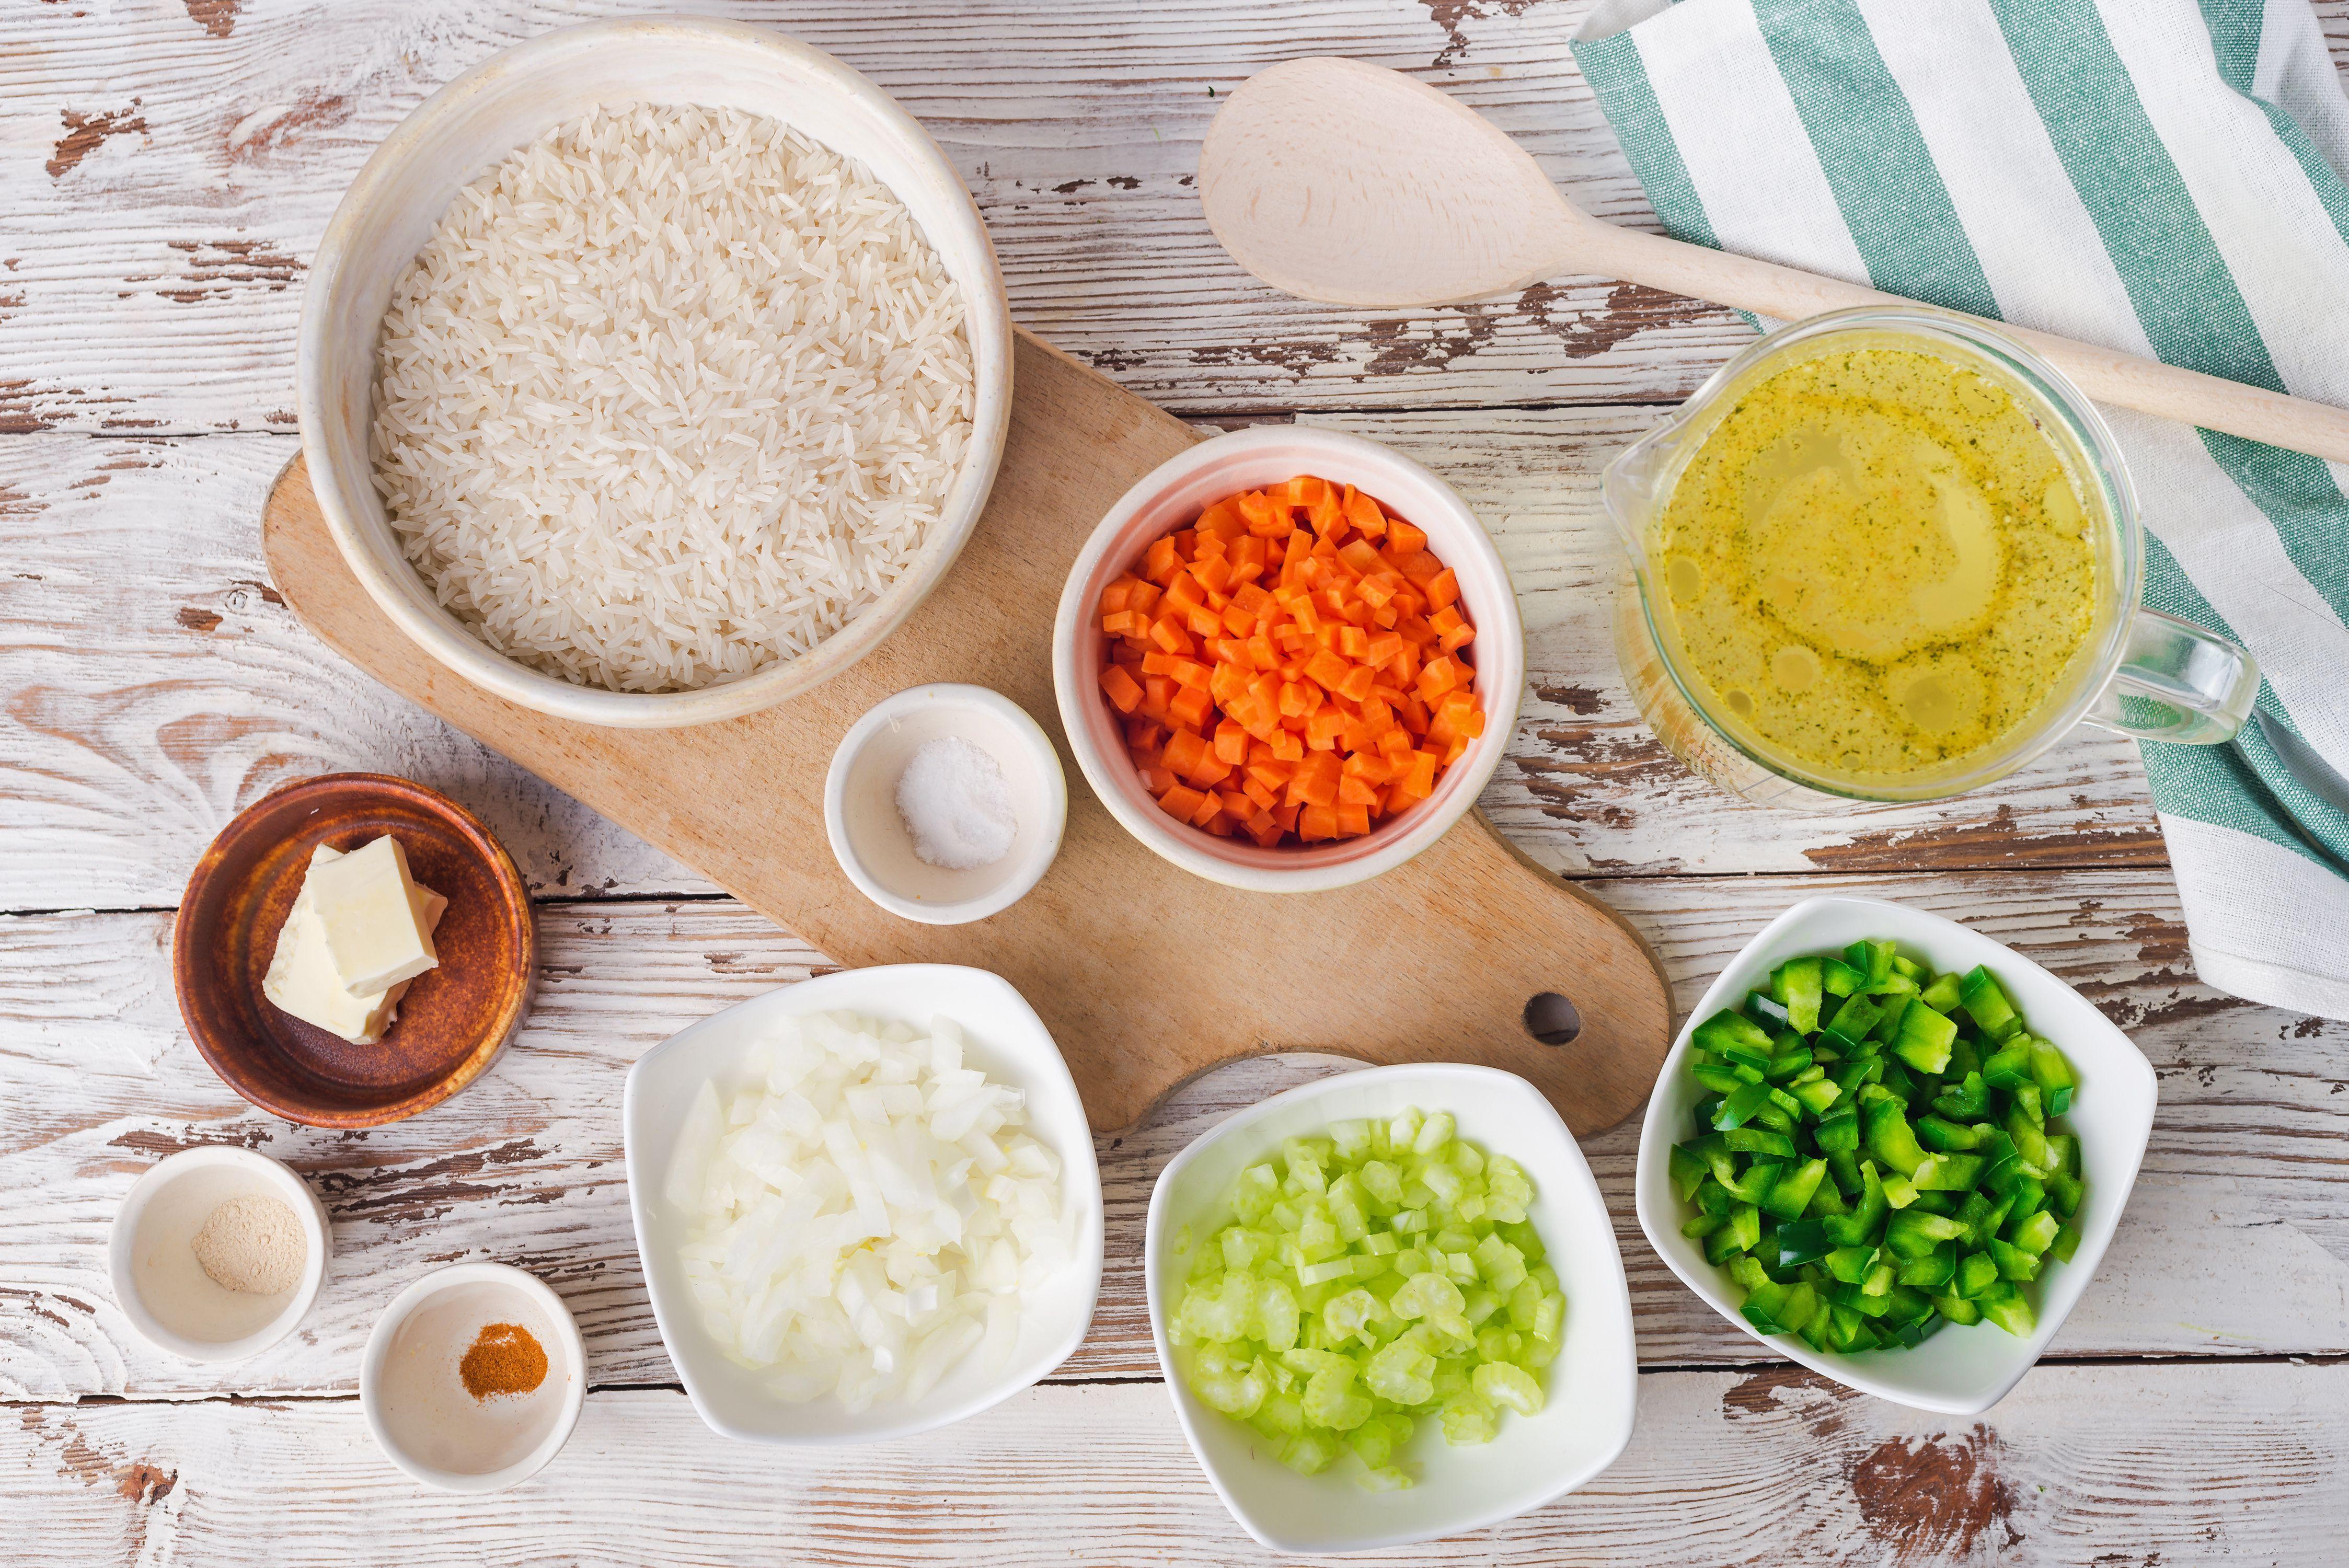 Easy rice with vegtables ingredients